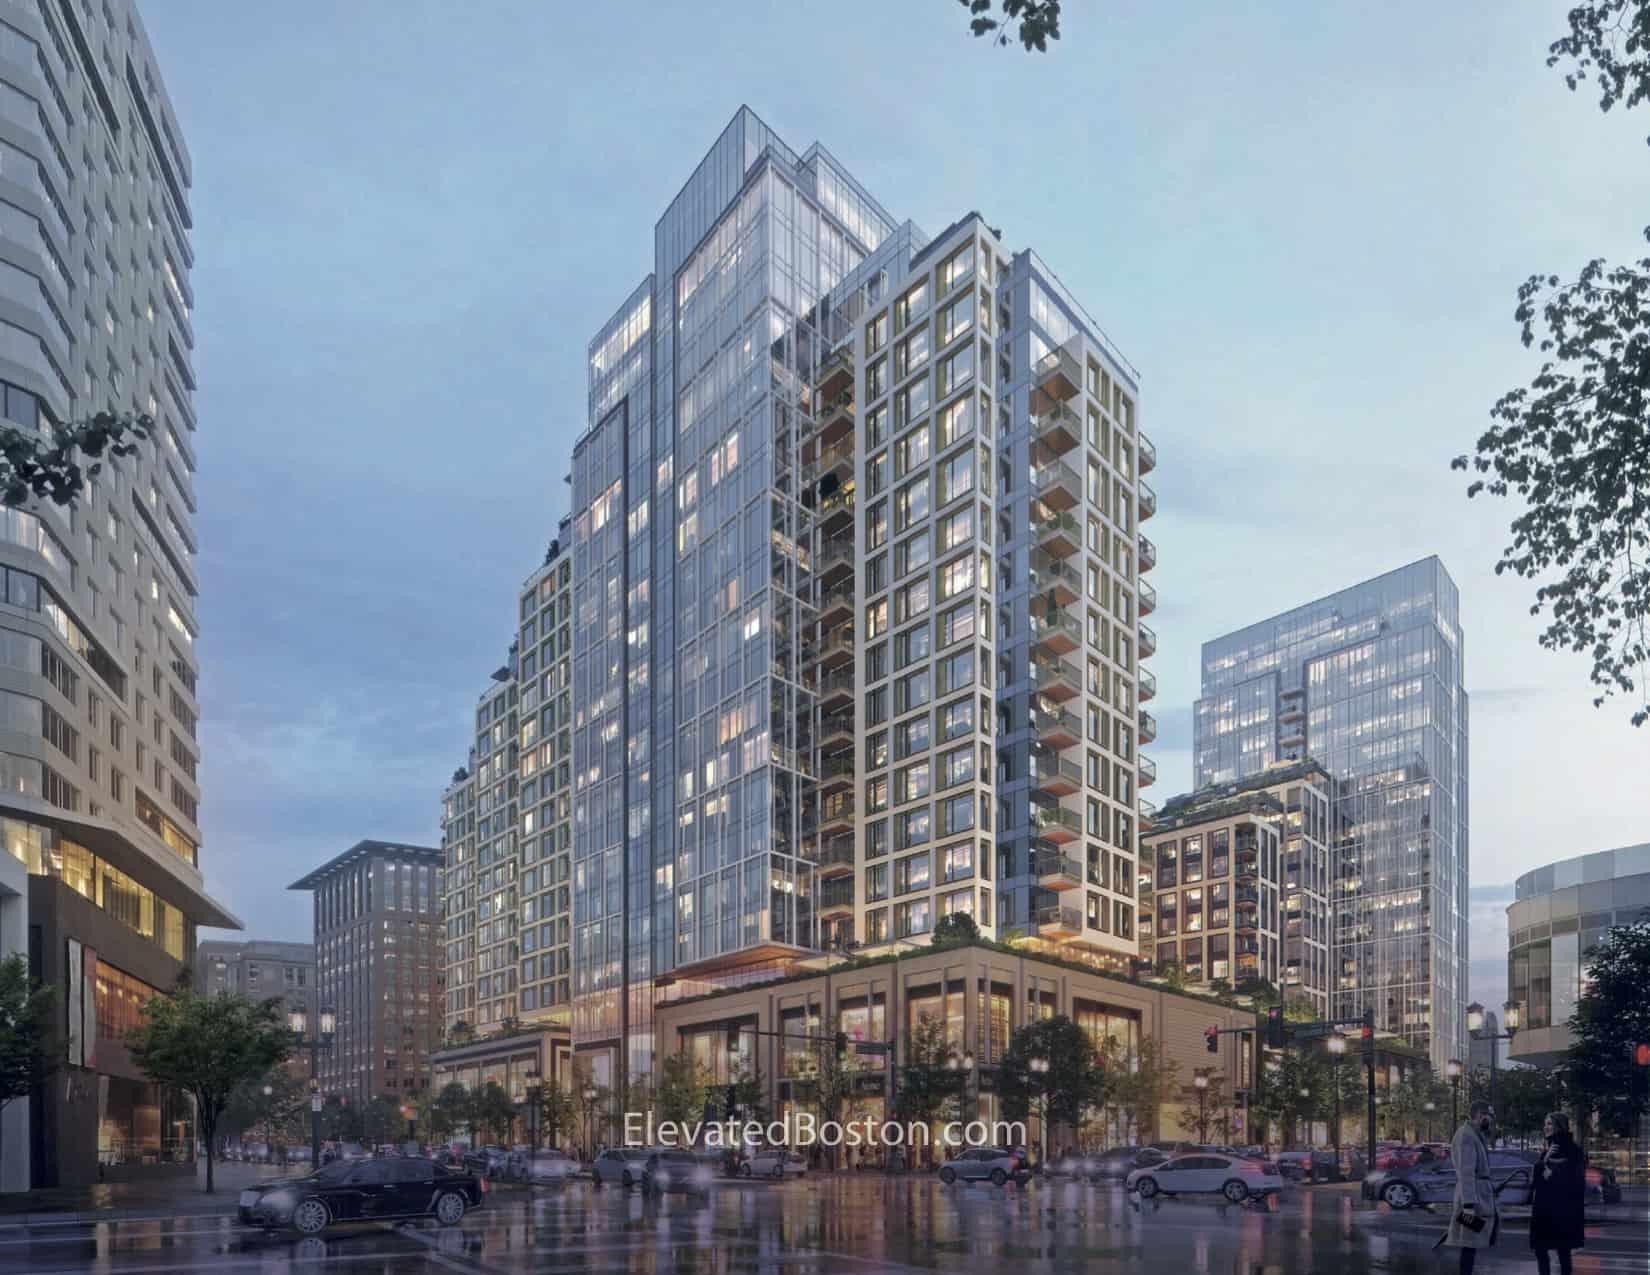 Echelon Seaport: The Building